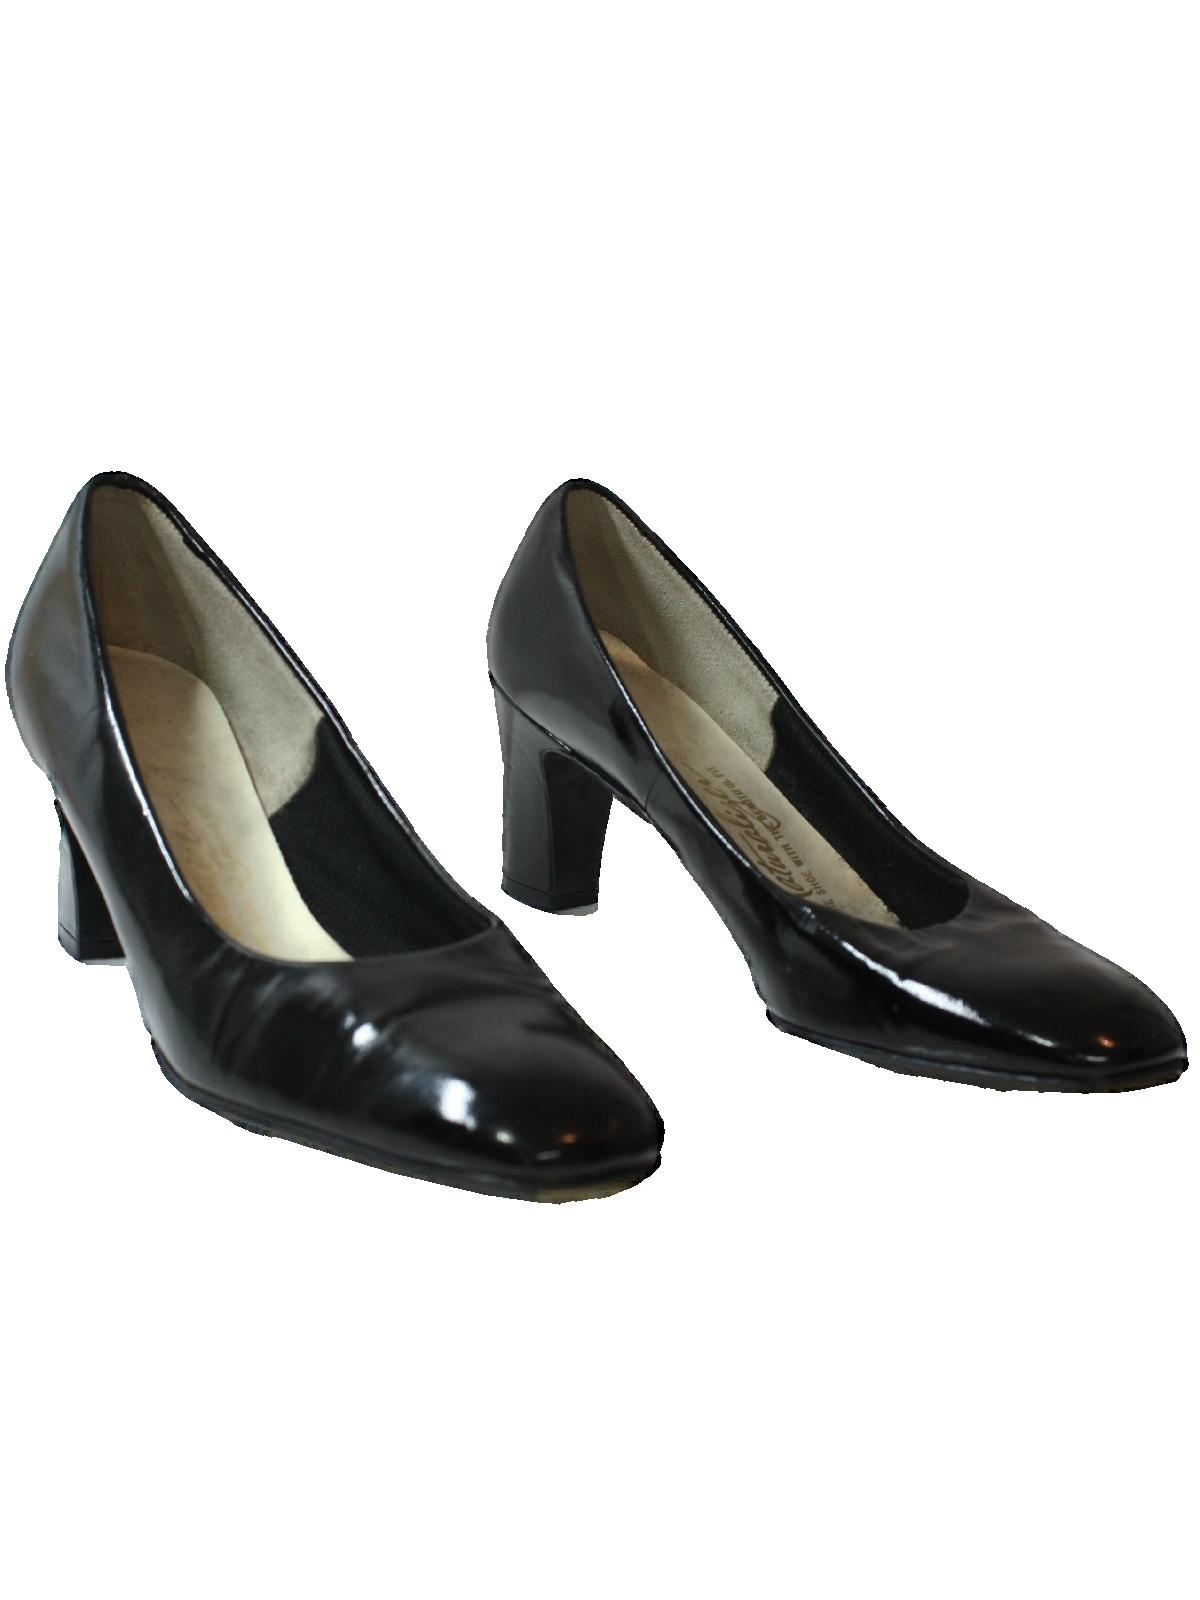 Vintage Naturalizer Sixties Shoes 60s Naturalizer